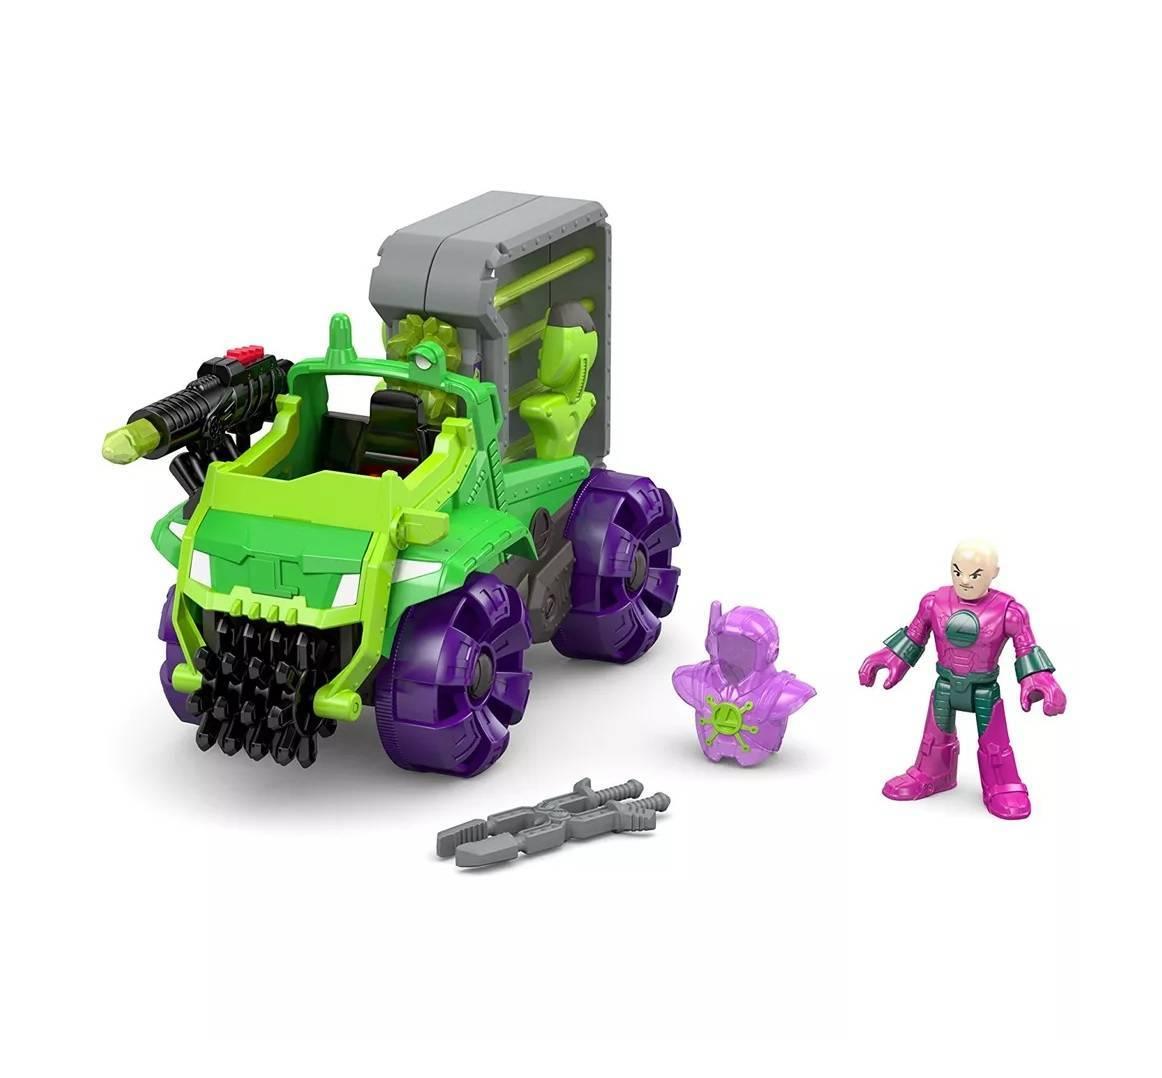 Lex Luthor Veículo Imaginext - Mattel DHT68 - Noy Brinquedos